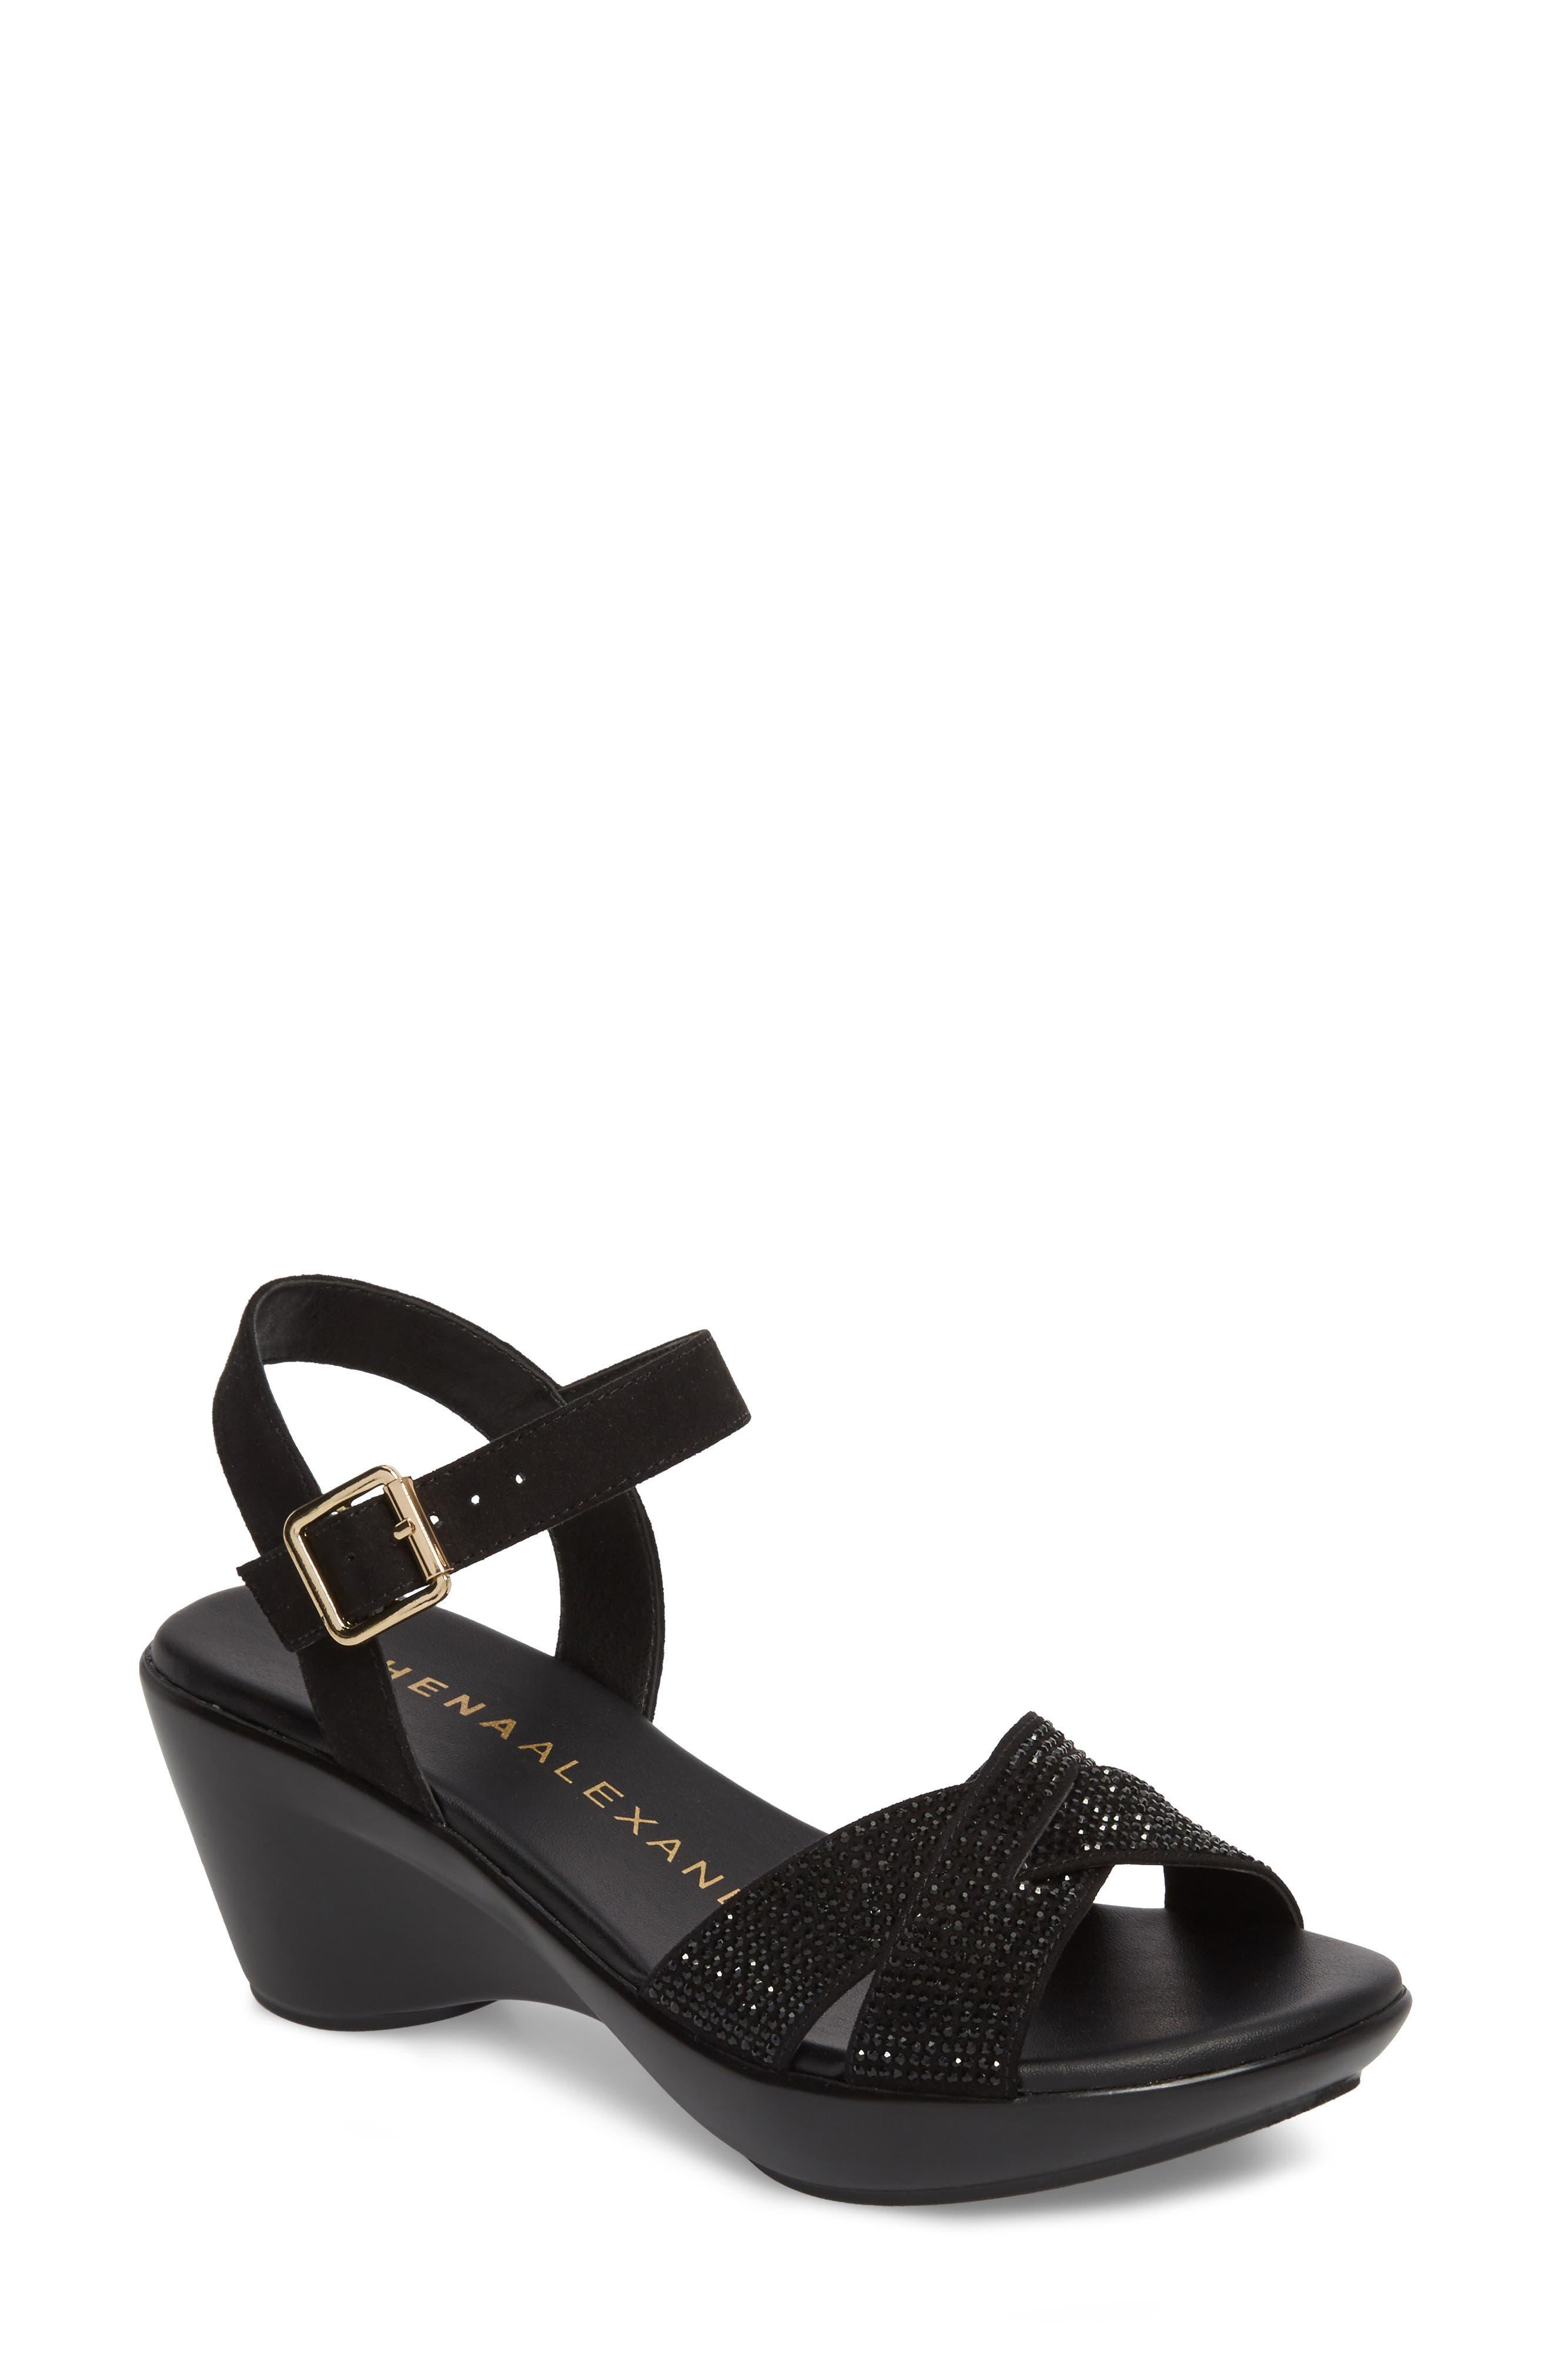 Florence Wedge Sandal,                         Main,                         color, Black Faux Suede